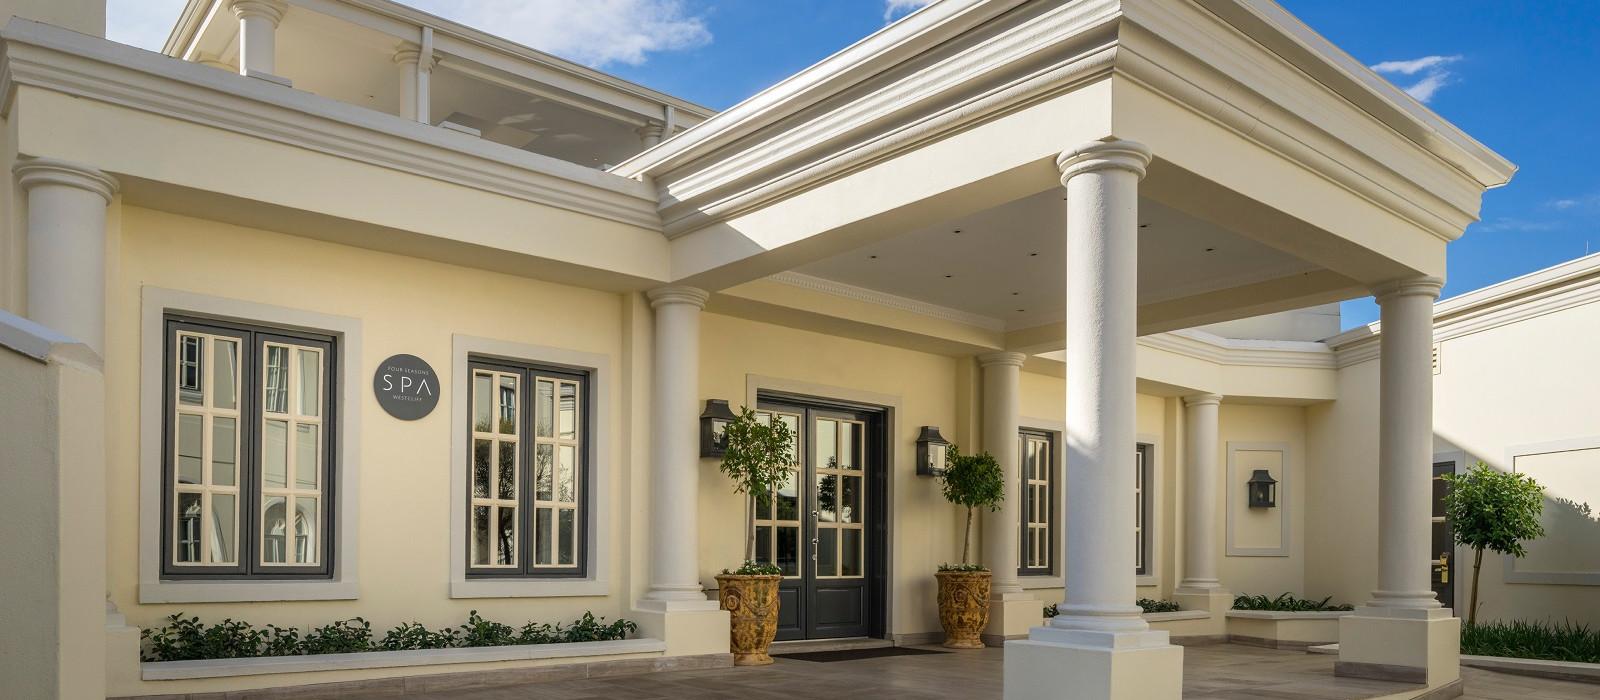 Hotel Four Seasons  The Westcliff Südafrika